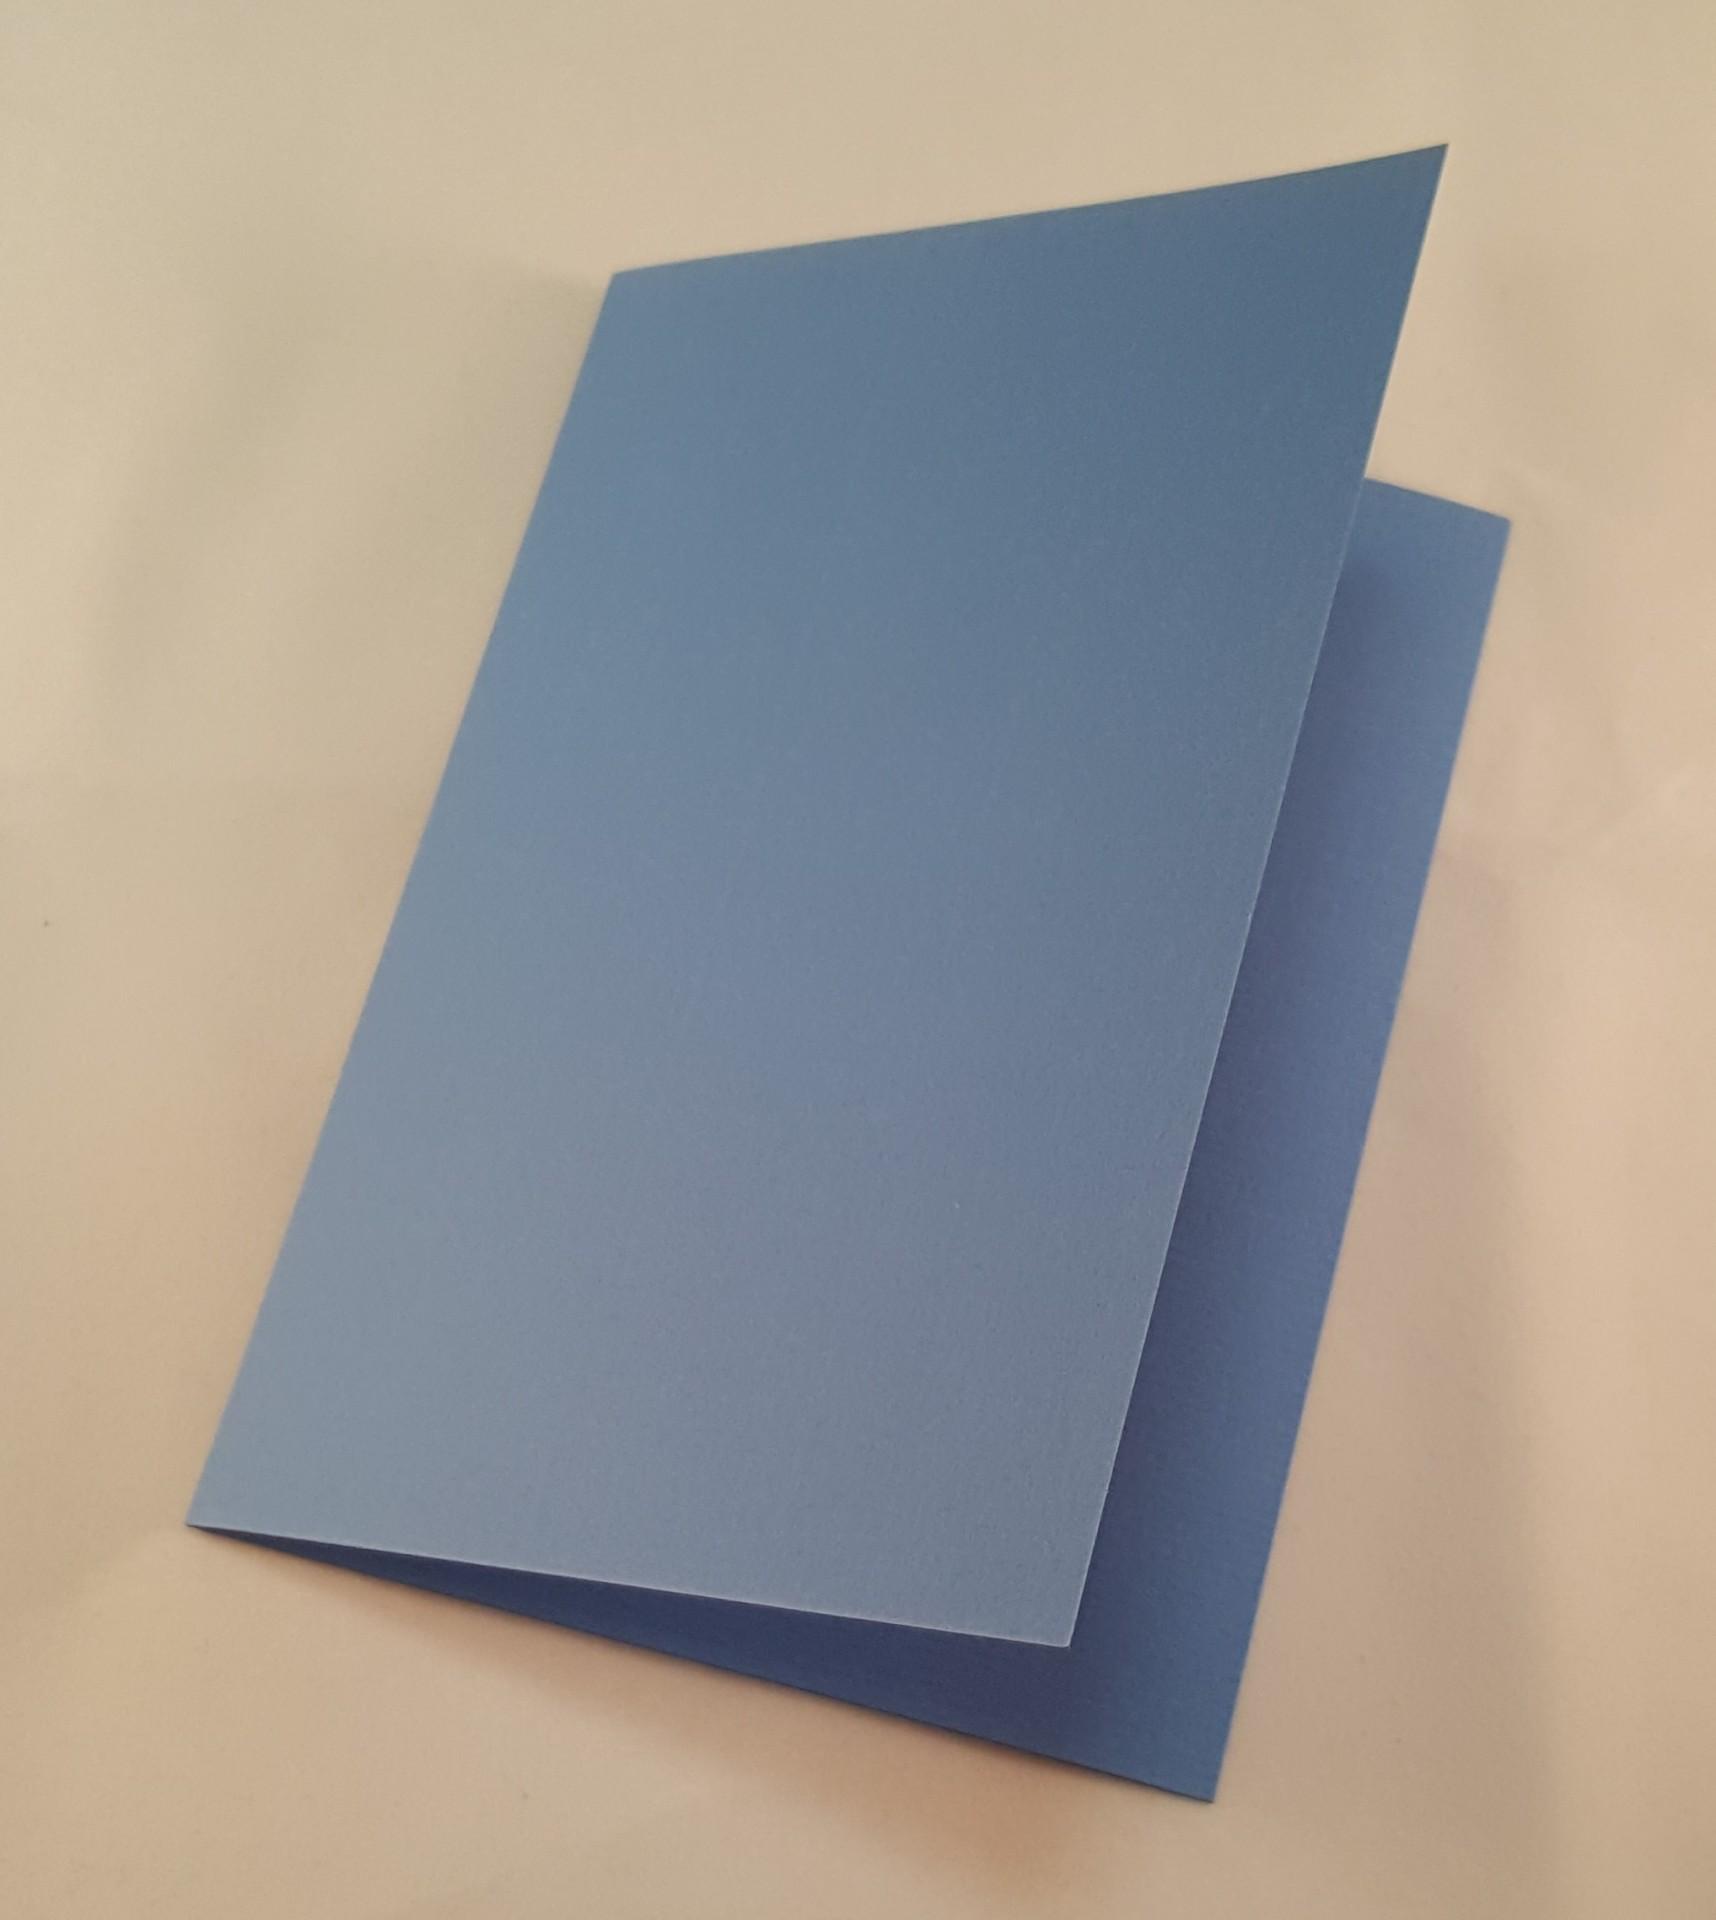 Cartão C6 colorido cor azul escuro